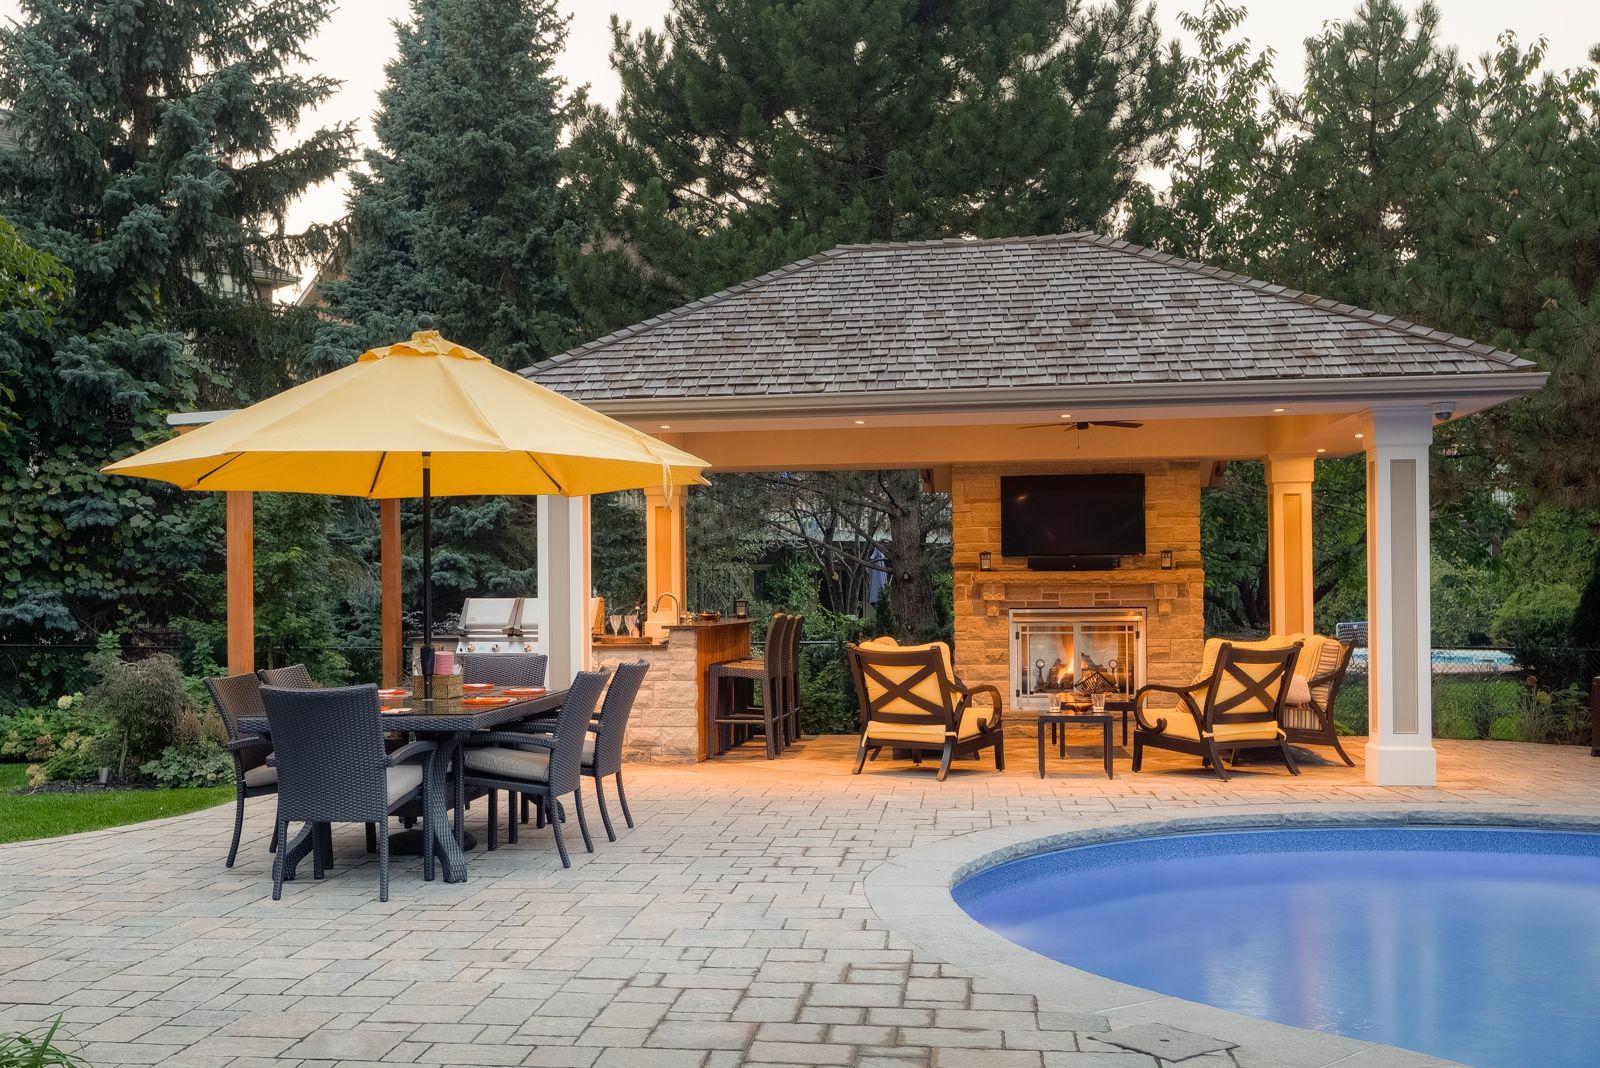 Cabana designs landscape design build cabanas and pool for Cabana design plans